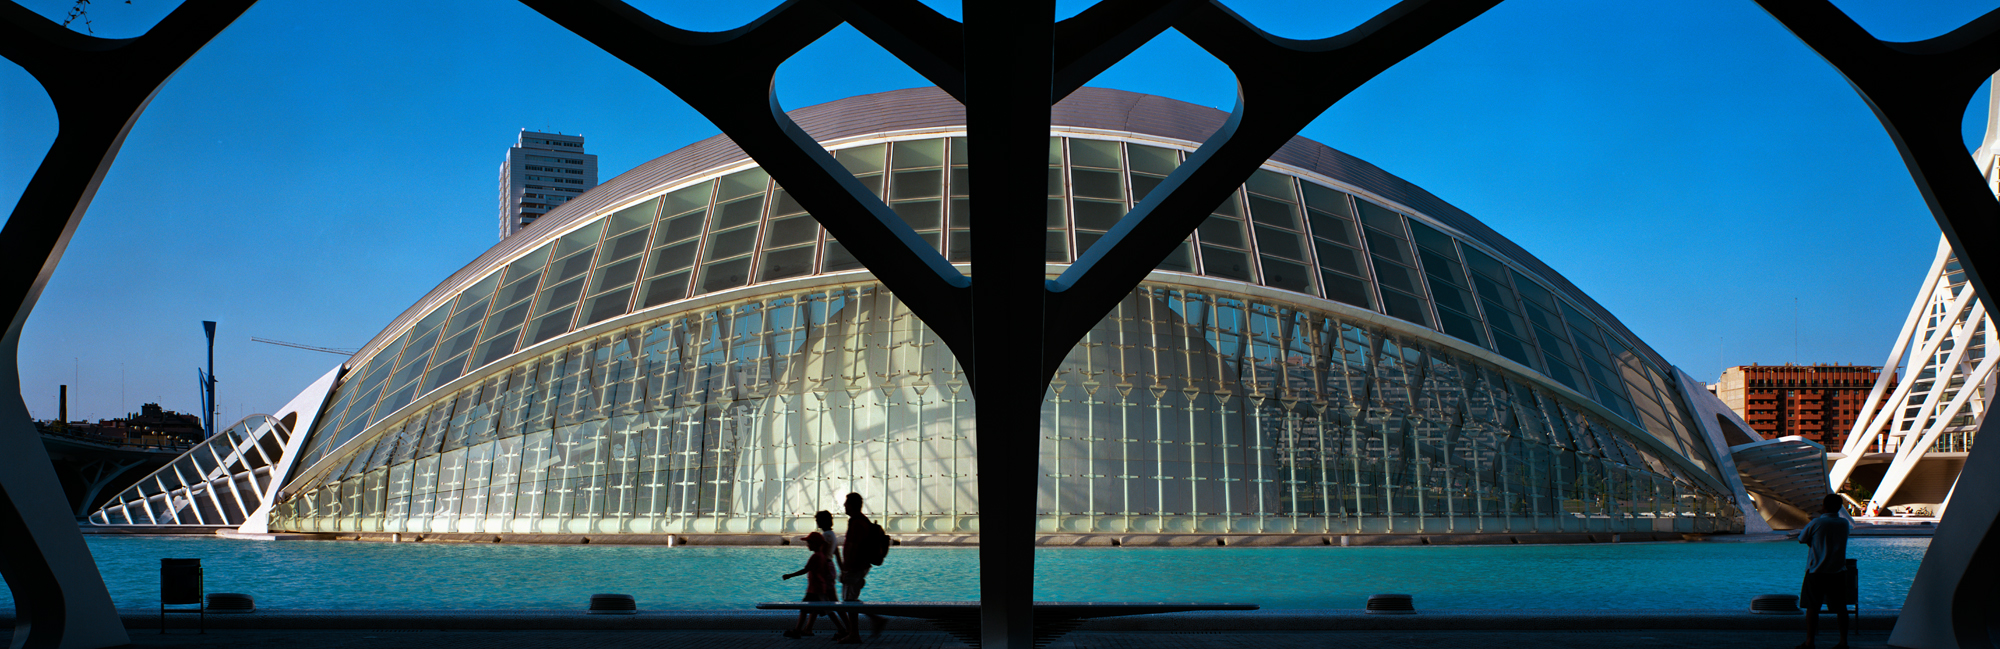 large format photography, Grossformatfotografie, Grossformatphotographie, Fotografie, Photographie, photography, 6x17, city, Stadt, Architektur, architecture, Beton, Stahl, concrete, steel, Calatrava, Expo,